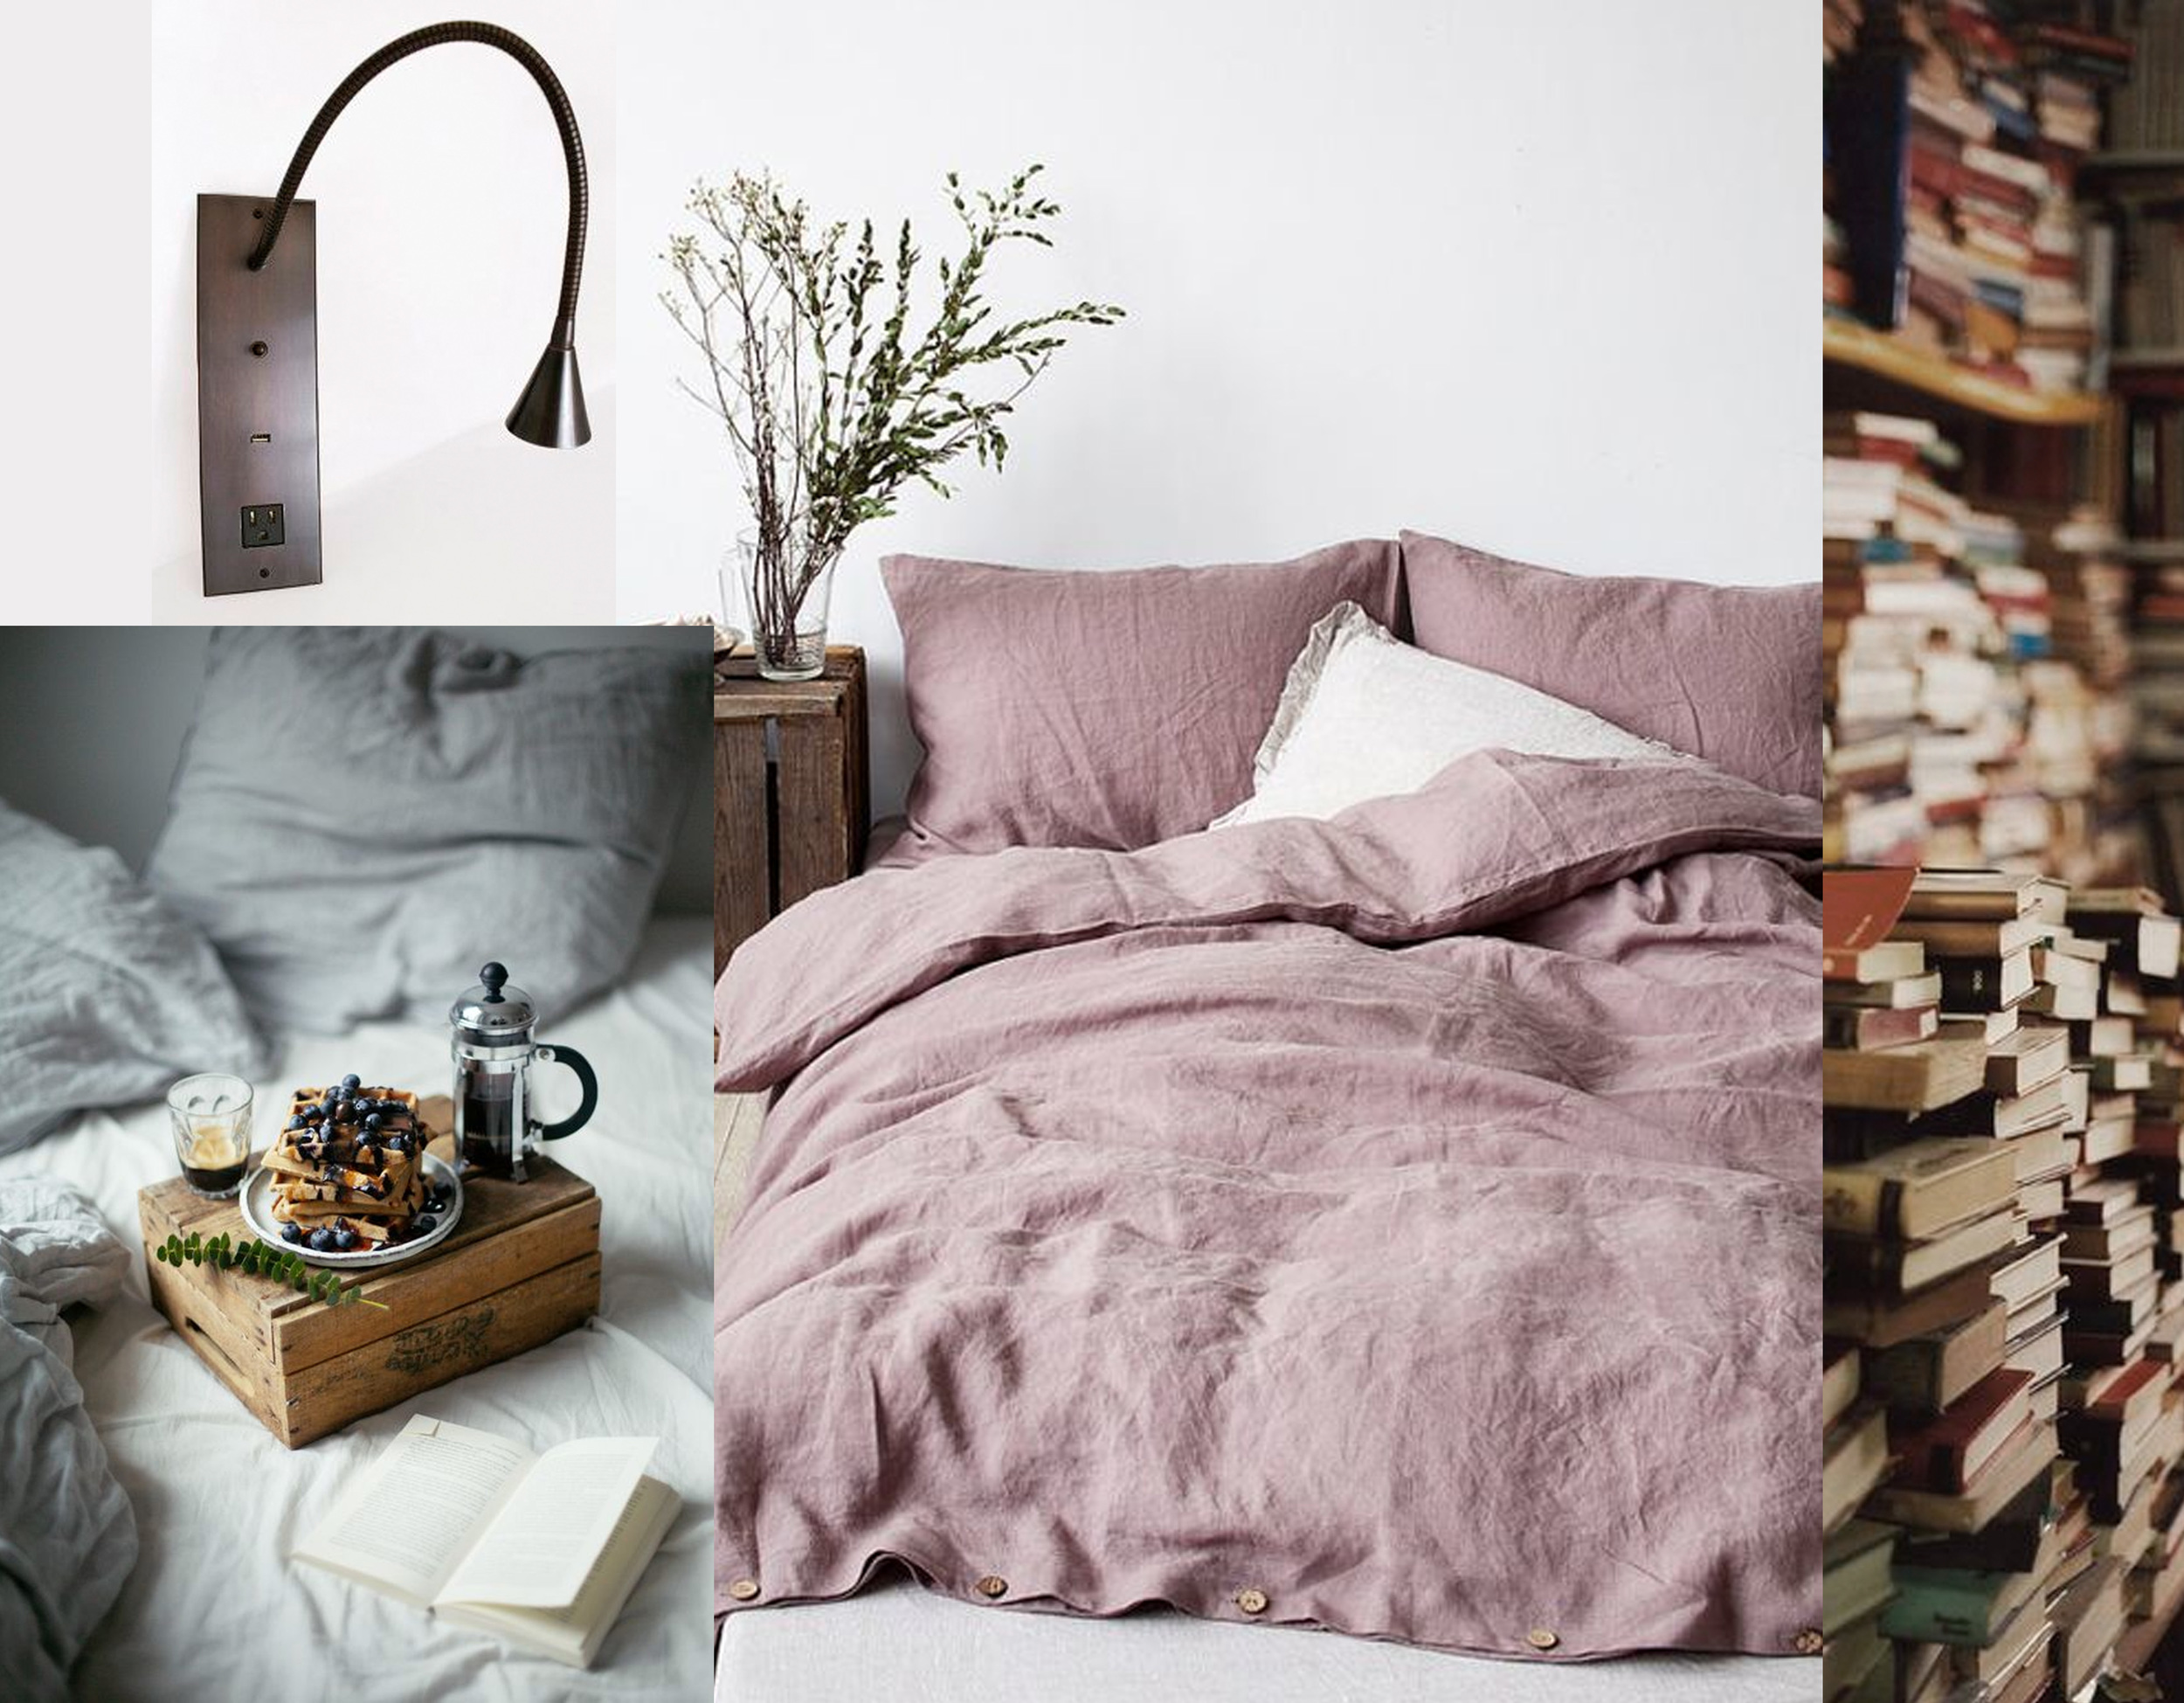 reading lamp  Meljac  - breakfast in bed via  Endless 8 Inspiration  - stone washed bedlinen  Linen Tales